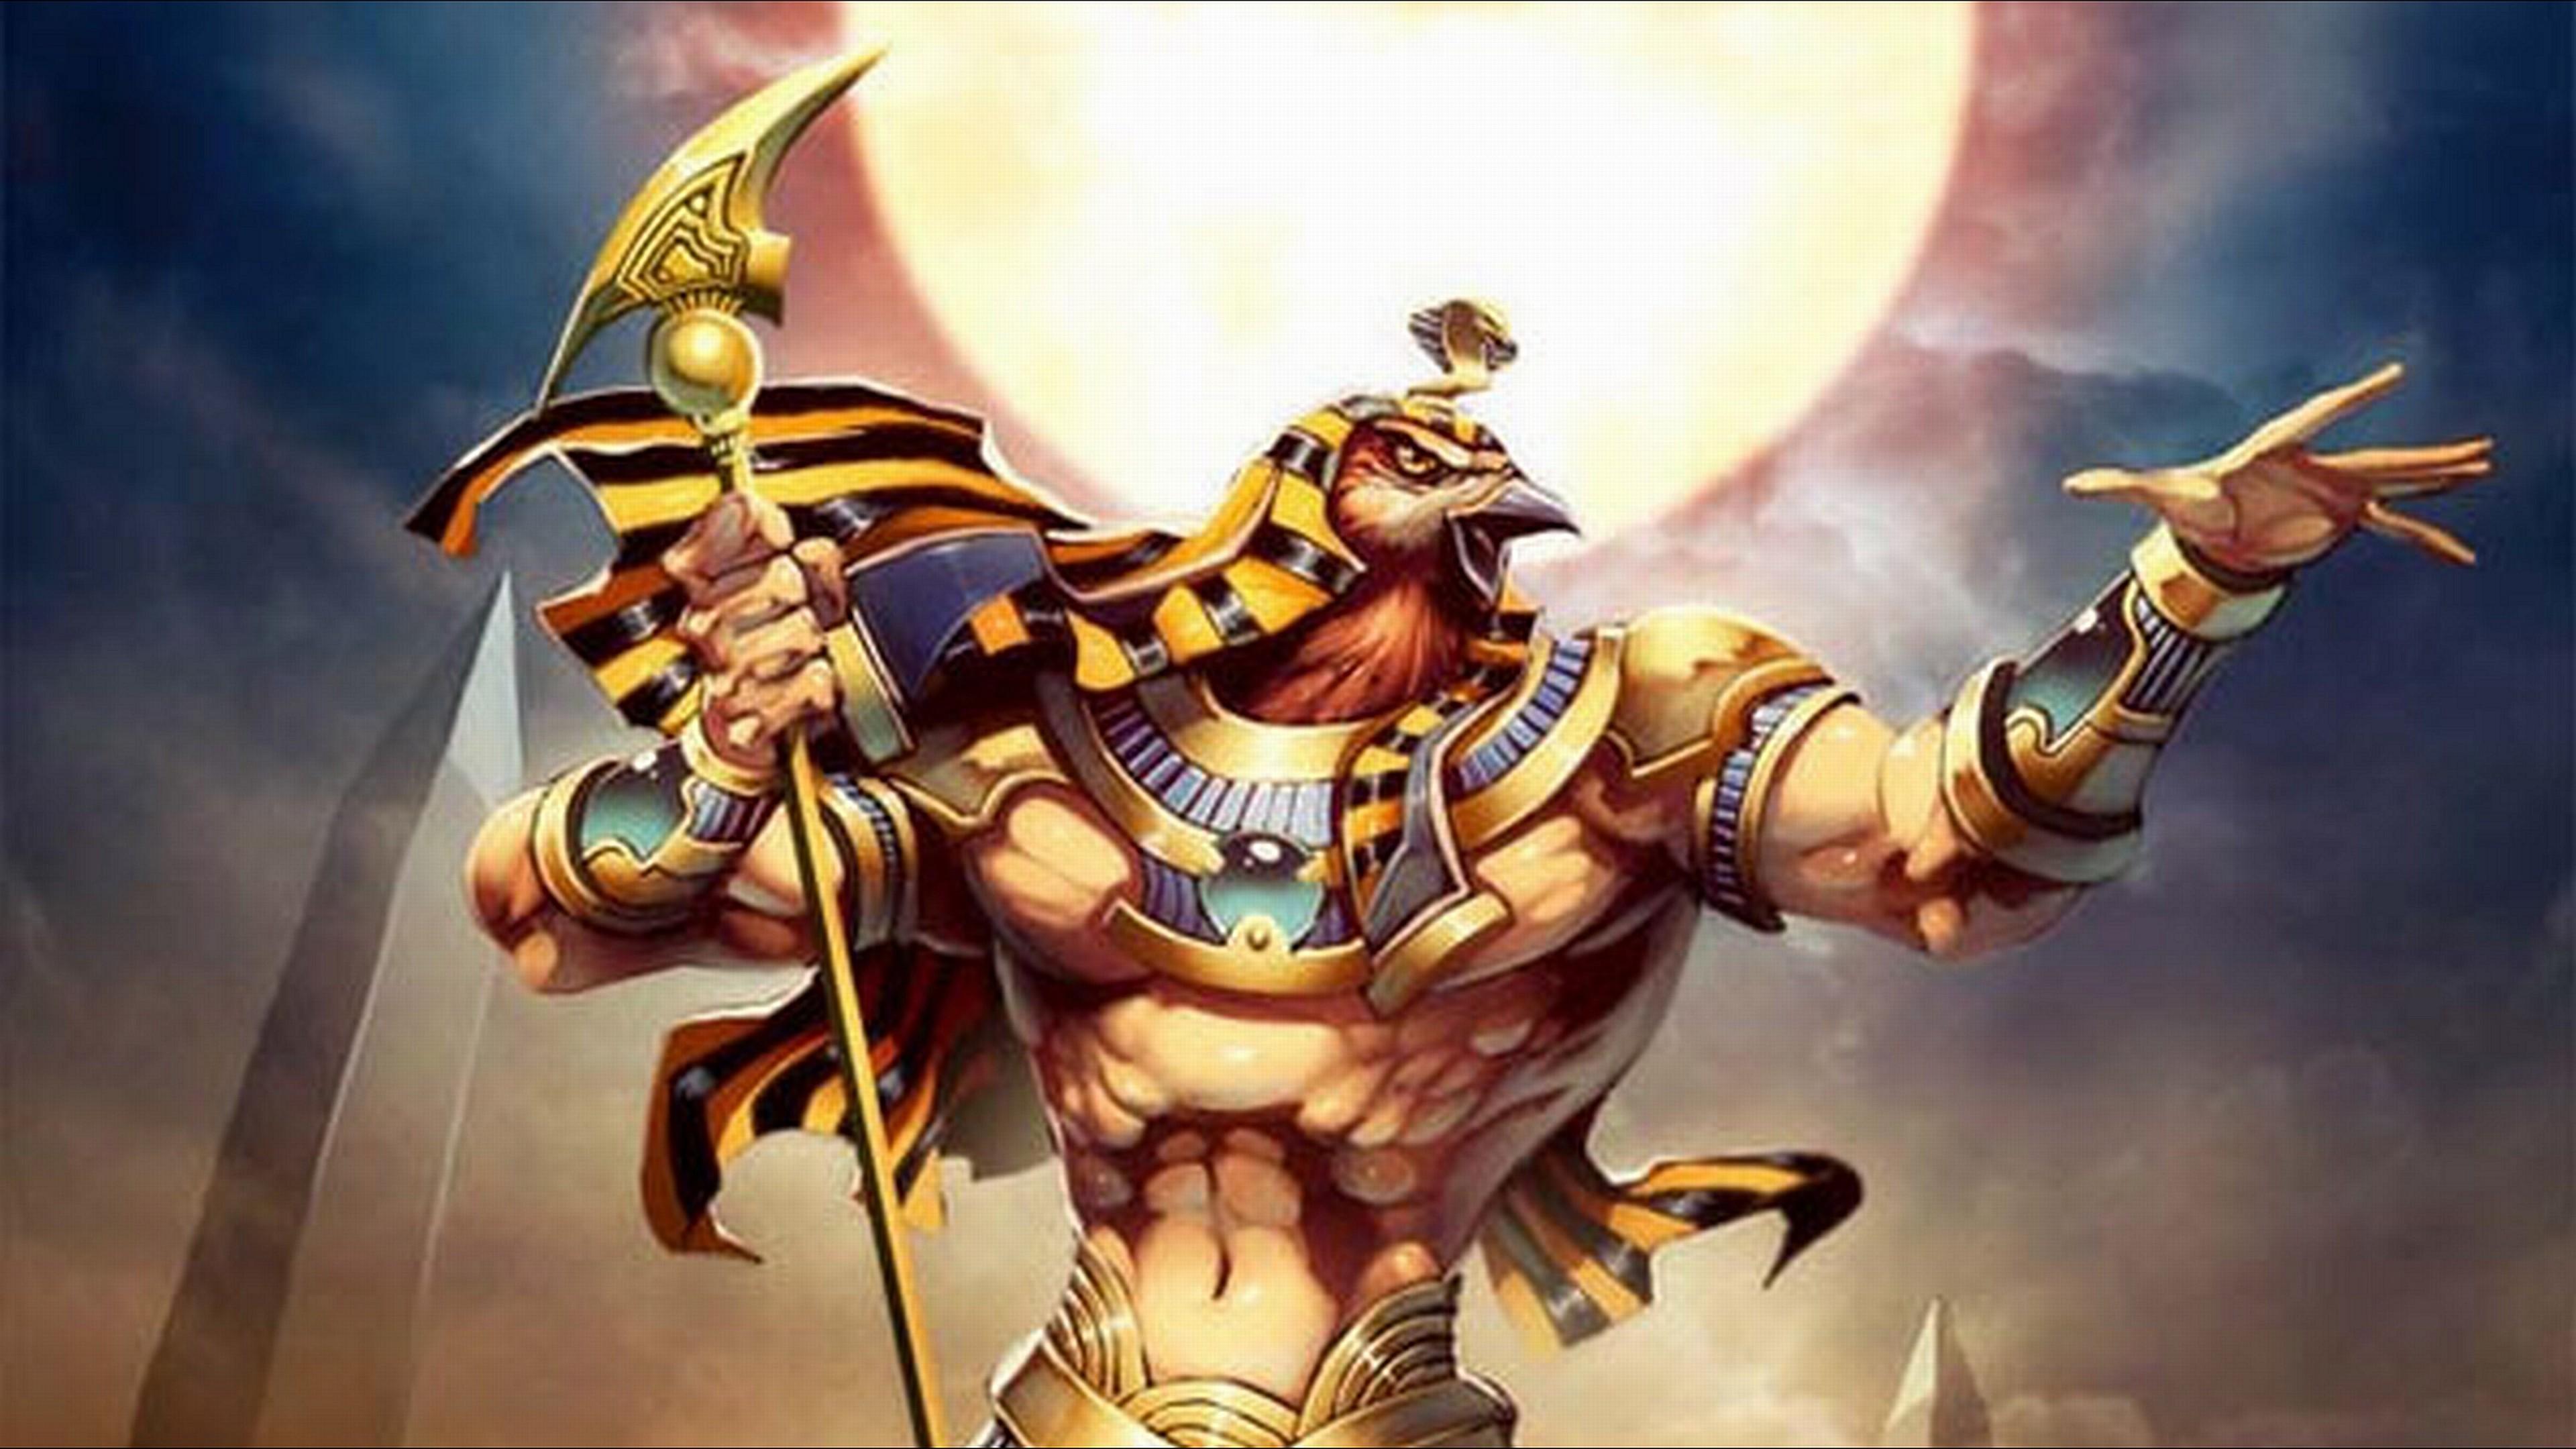 Egyptian Gods Wallpaper Backgrounds 66 Images